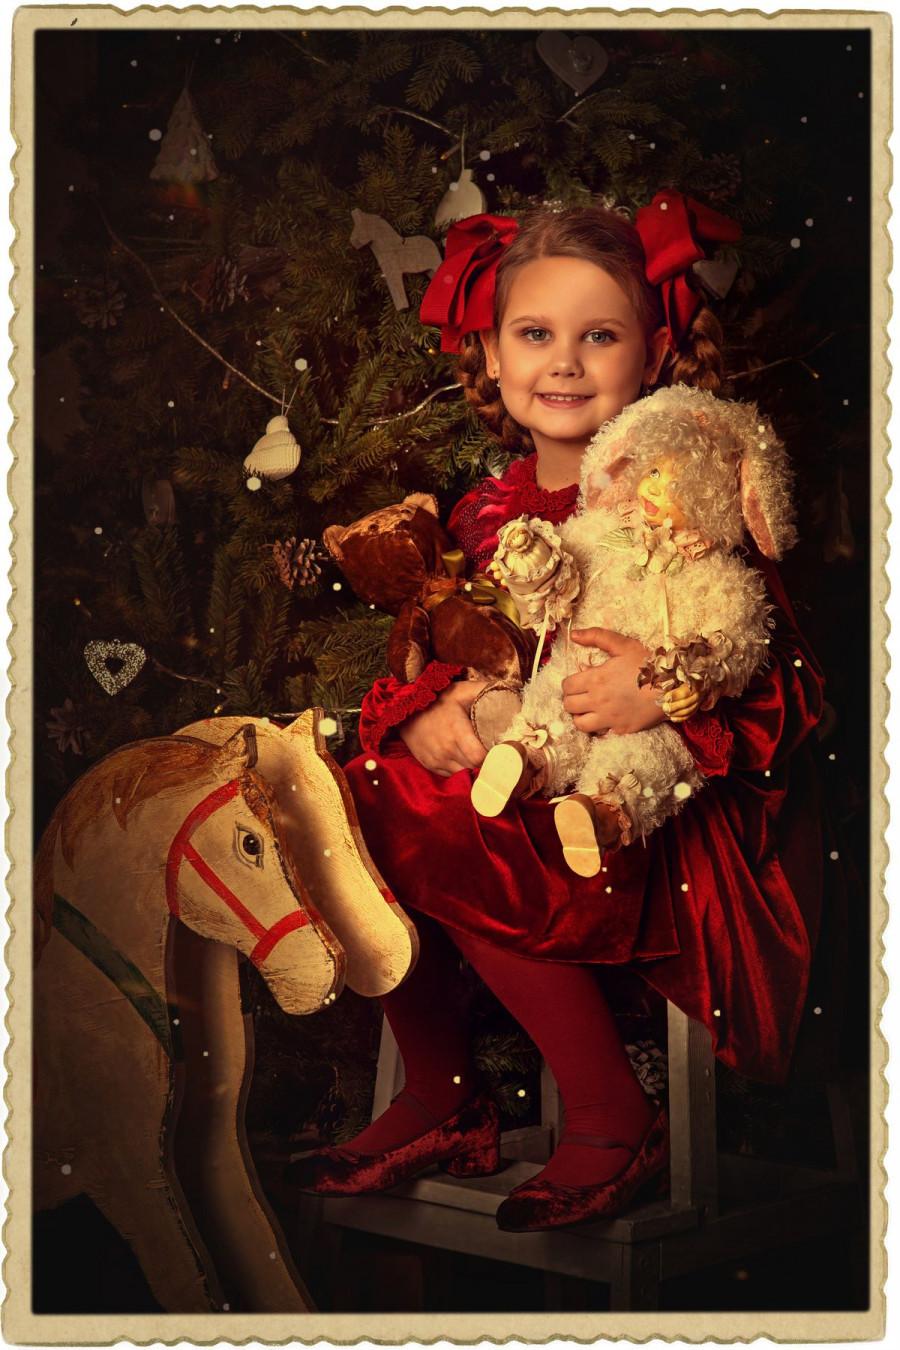 Алина Курицина, 6 лет, дочь Натальи Степановой (школа моды New Style).